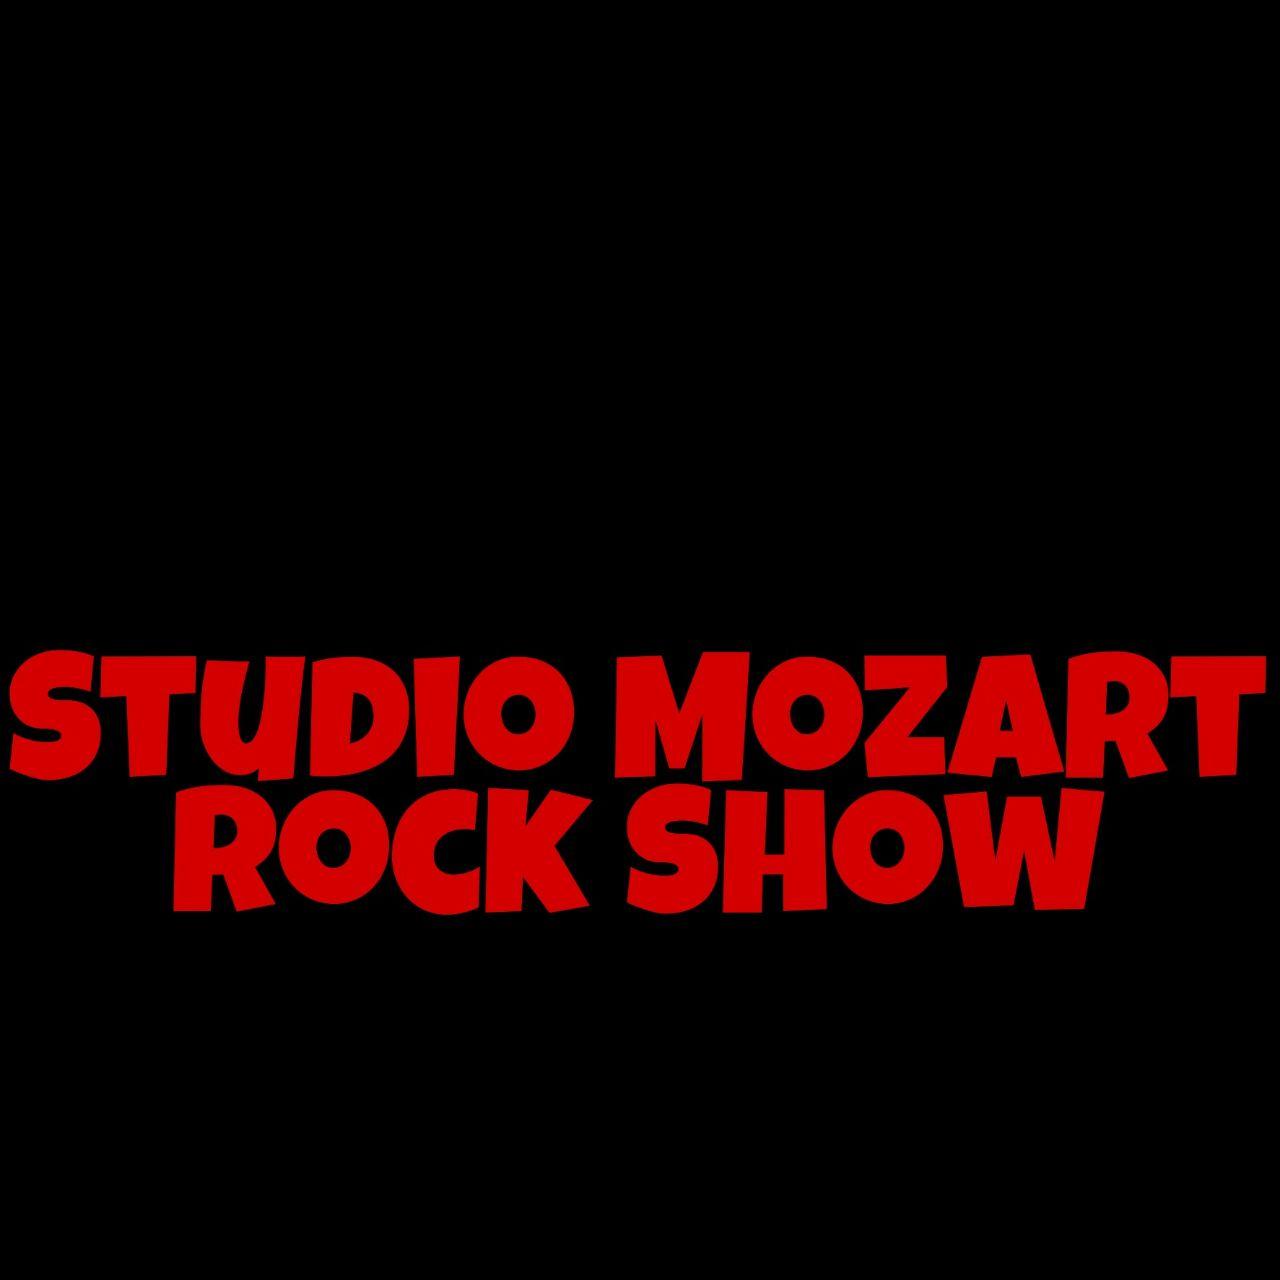 Studio Mozart Rock Show